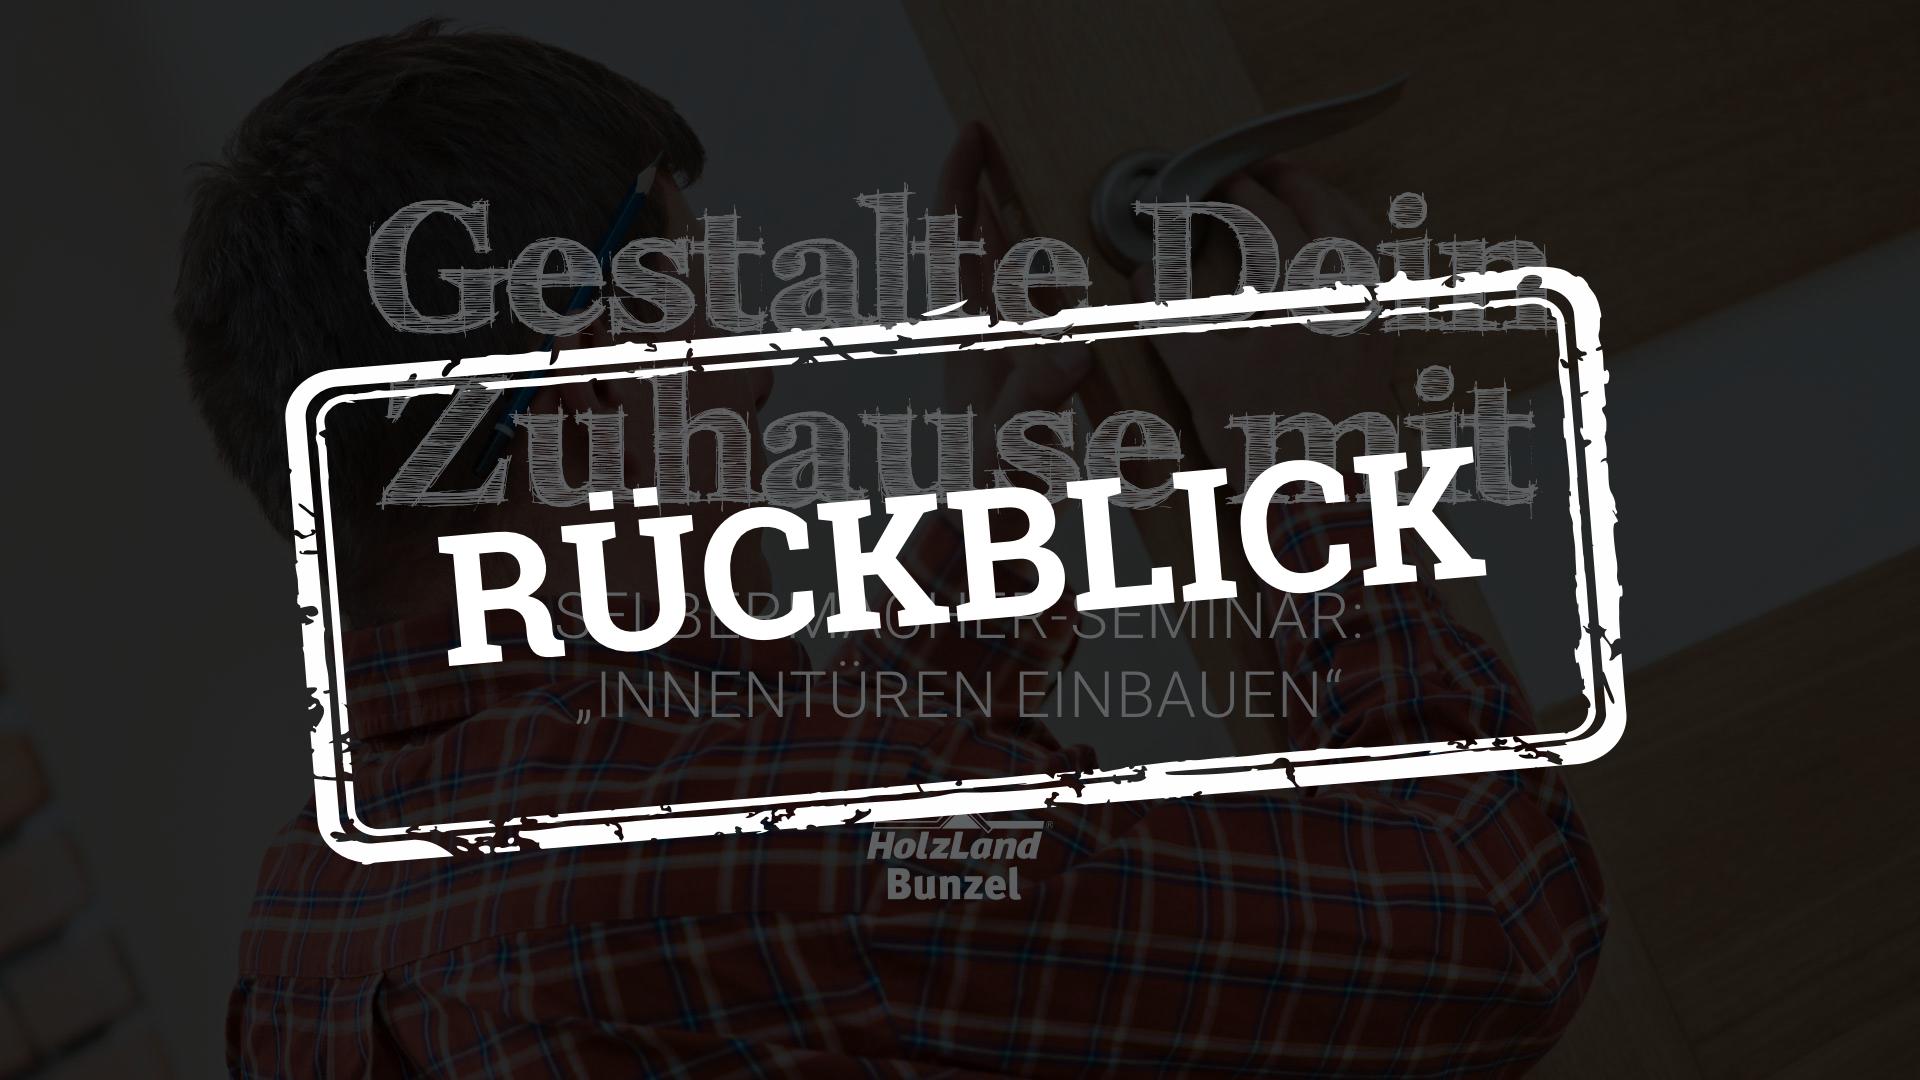 Rückblick: Innentüren einbauen 2018 | DIY-Seminar | HolzLand Bunzel in Marl